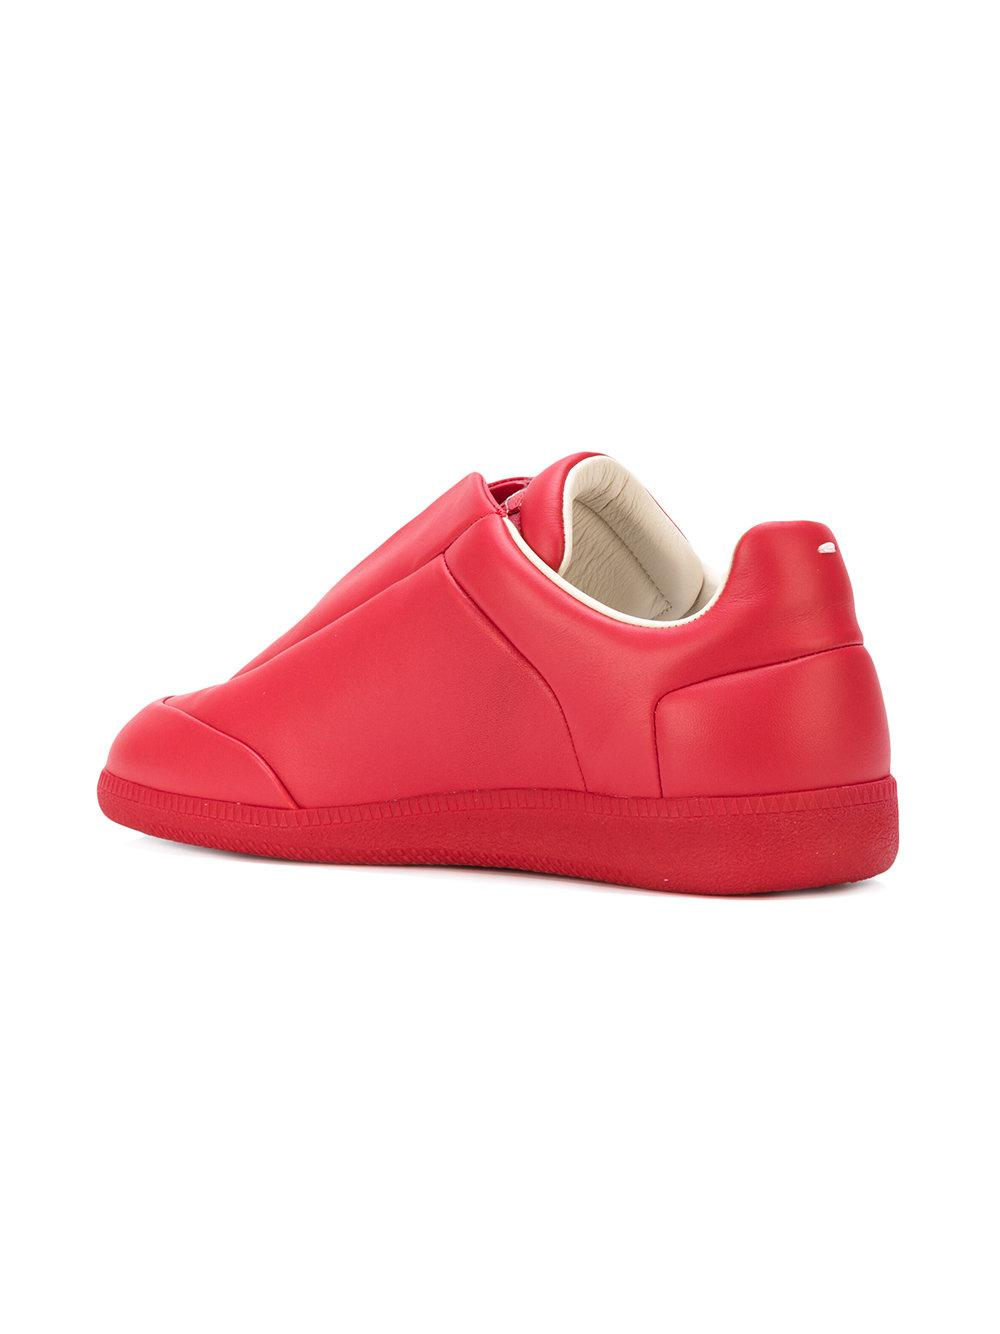 foldover top sneakers - Red Maison Martin Margiela EYn0f